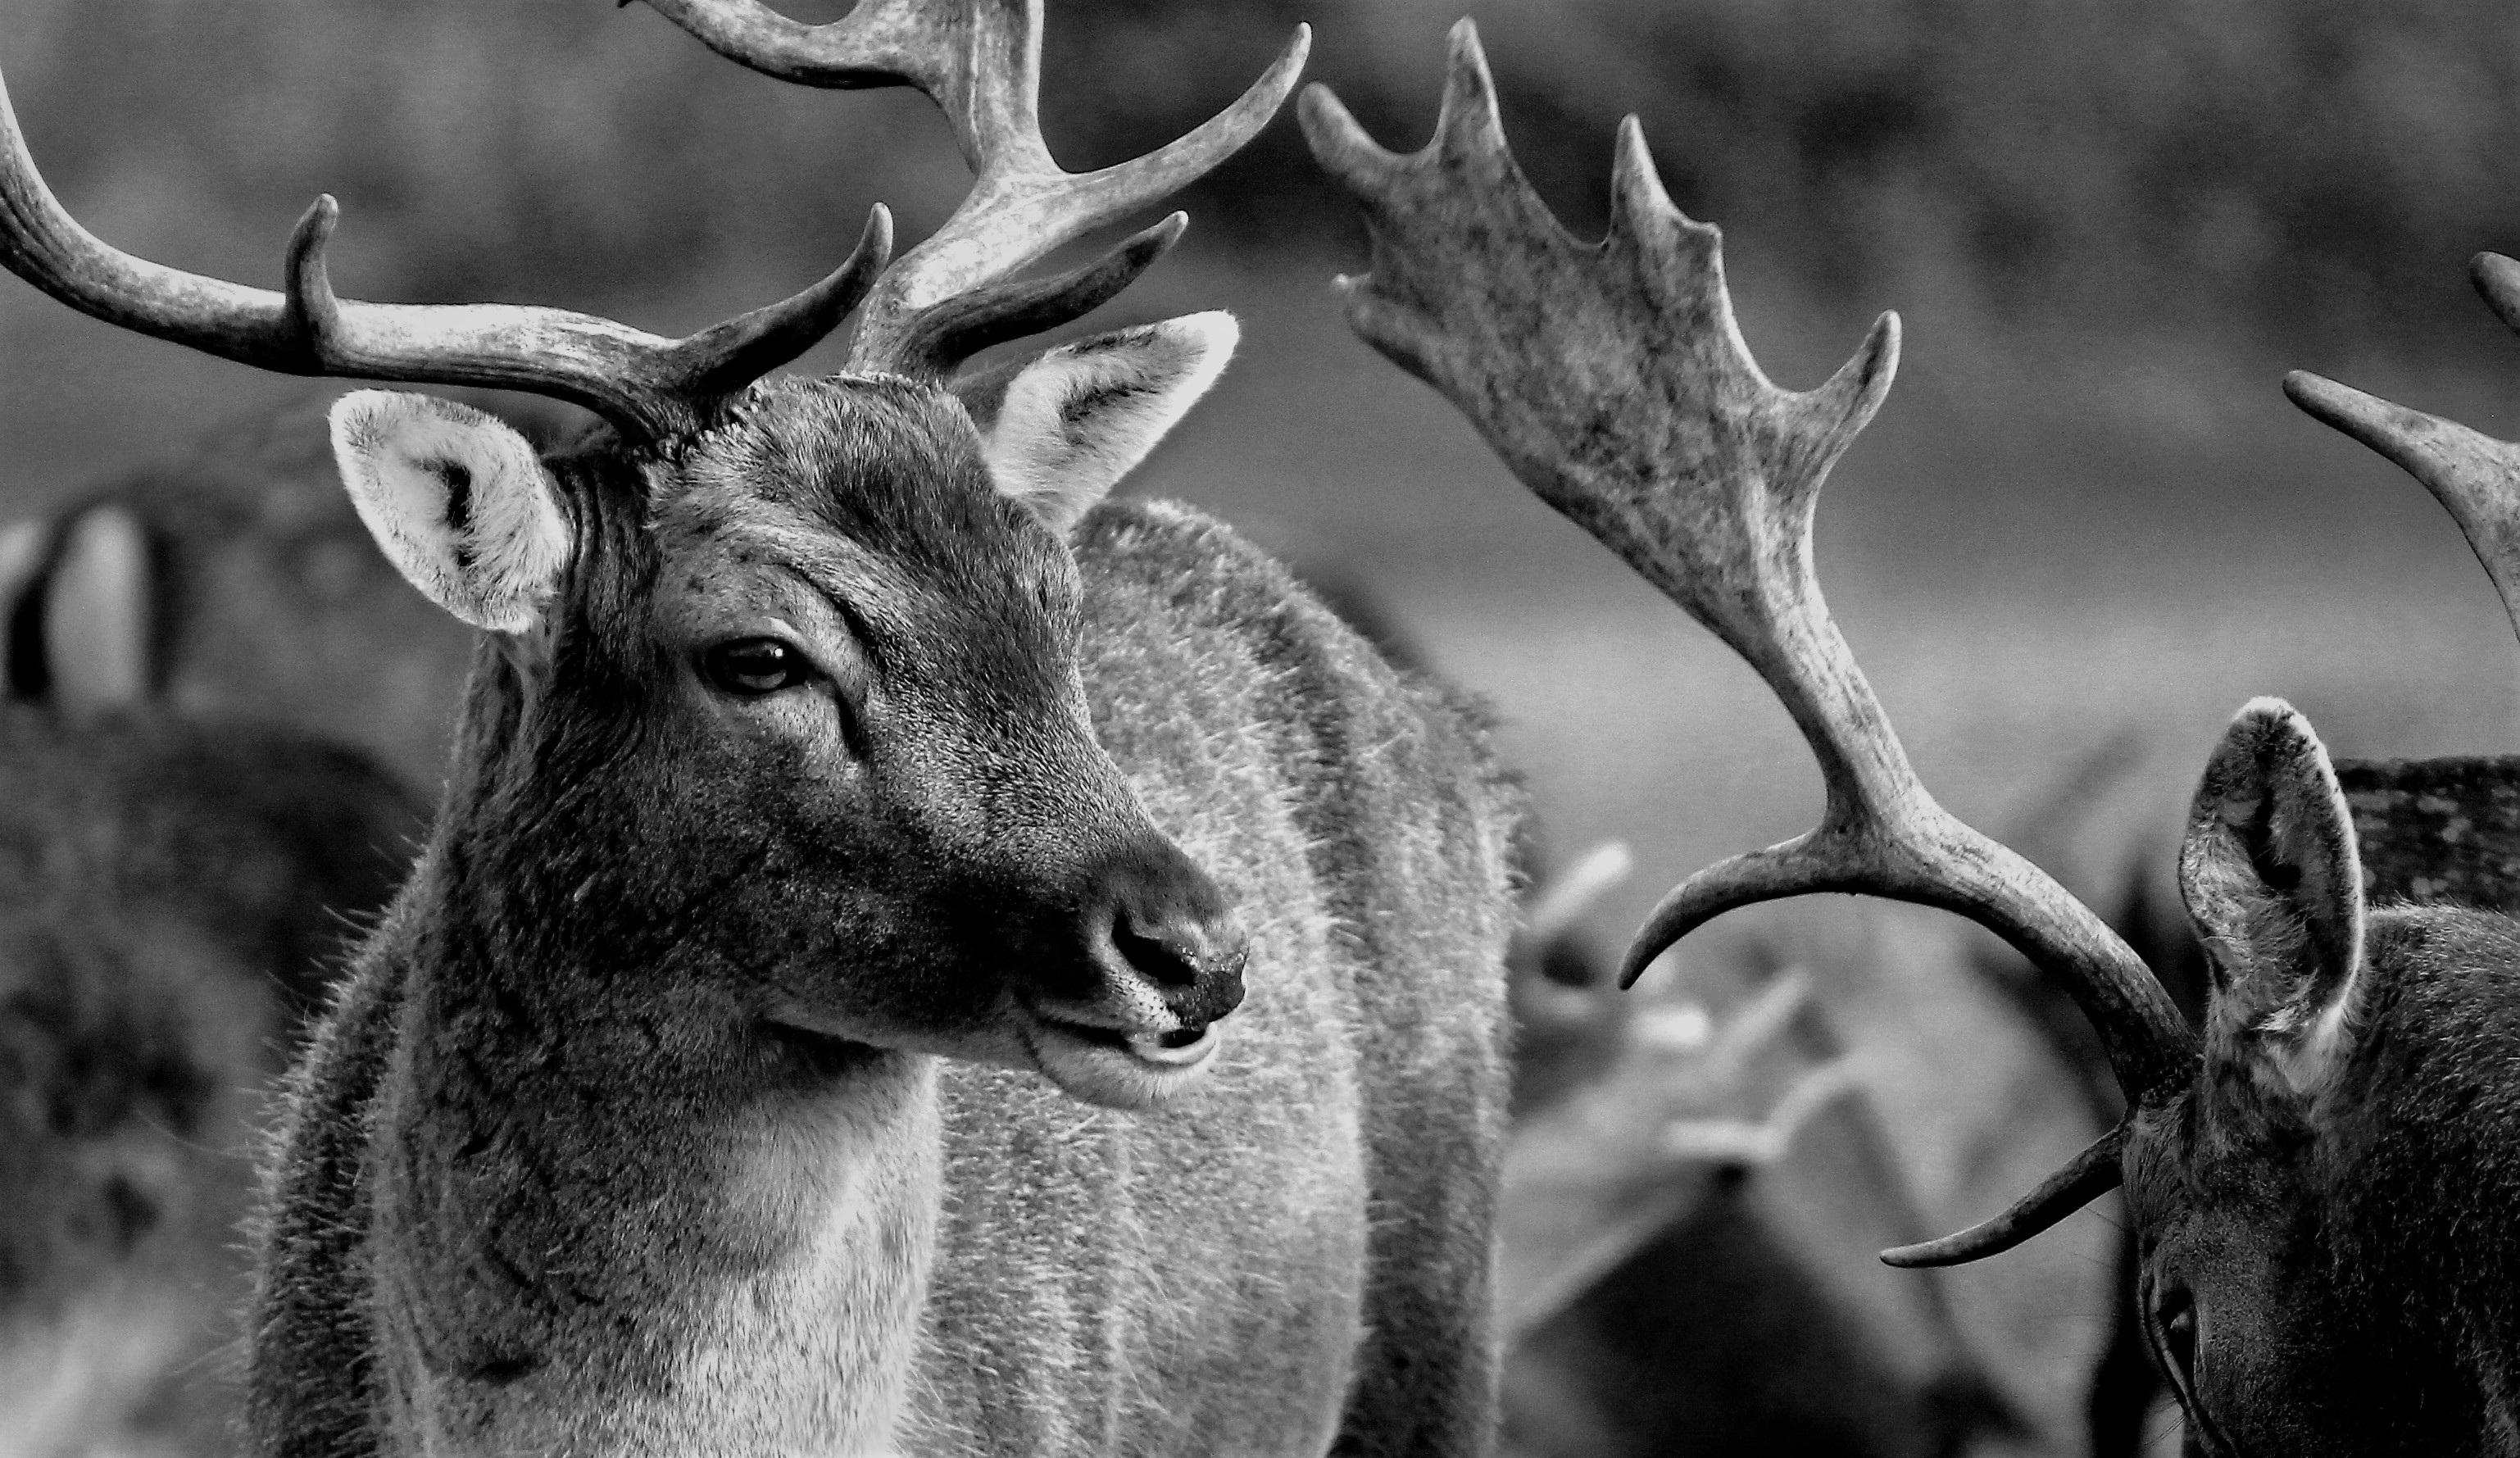 Wild Deer, Animal, Closeup, Deer, Fur, HQ Photo